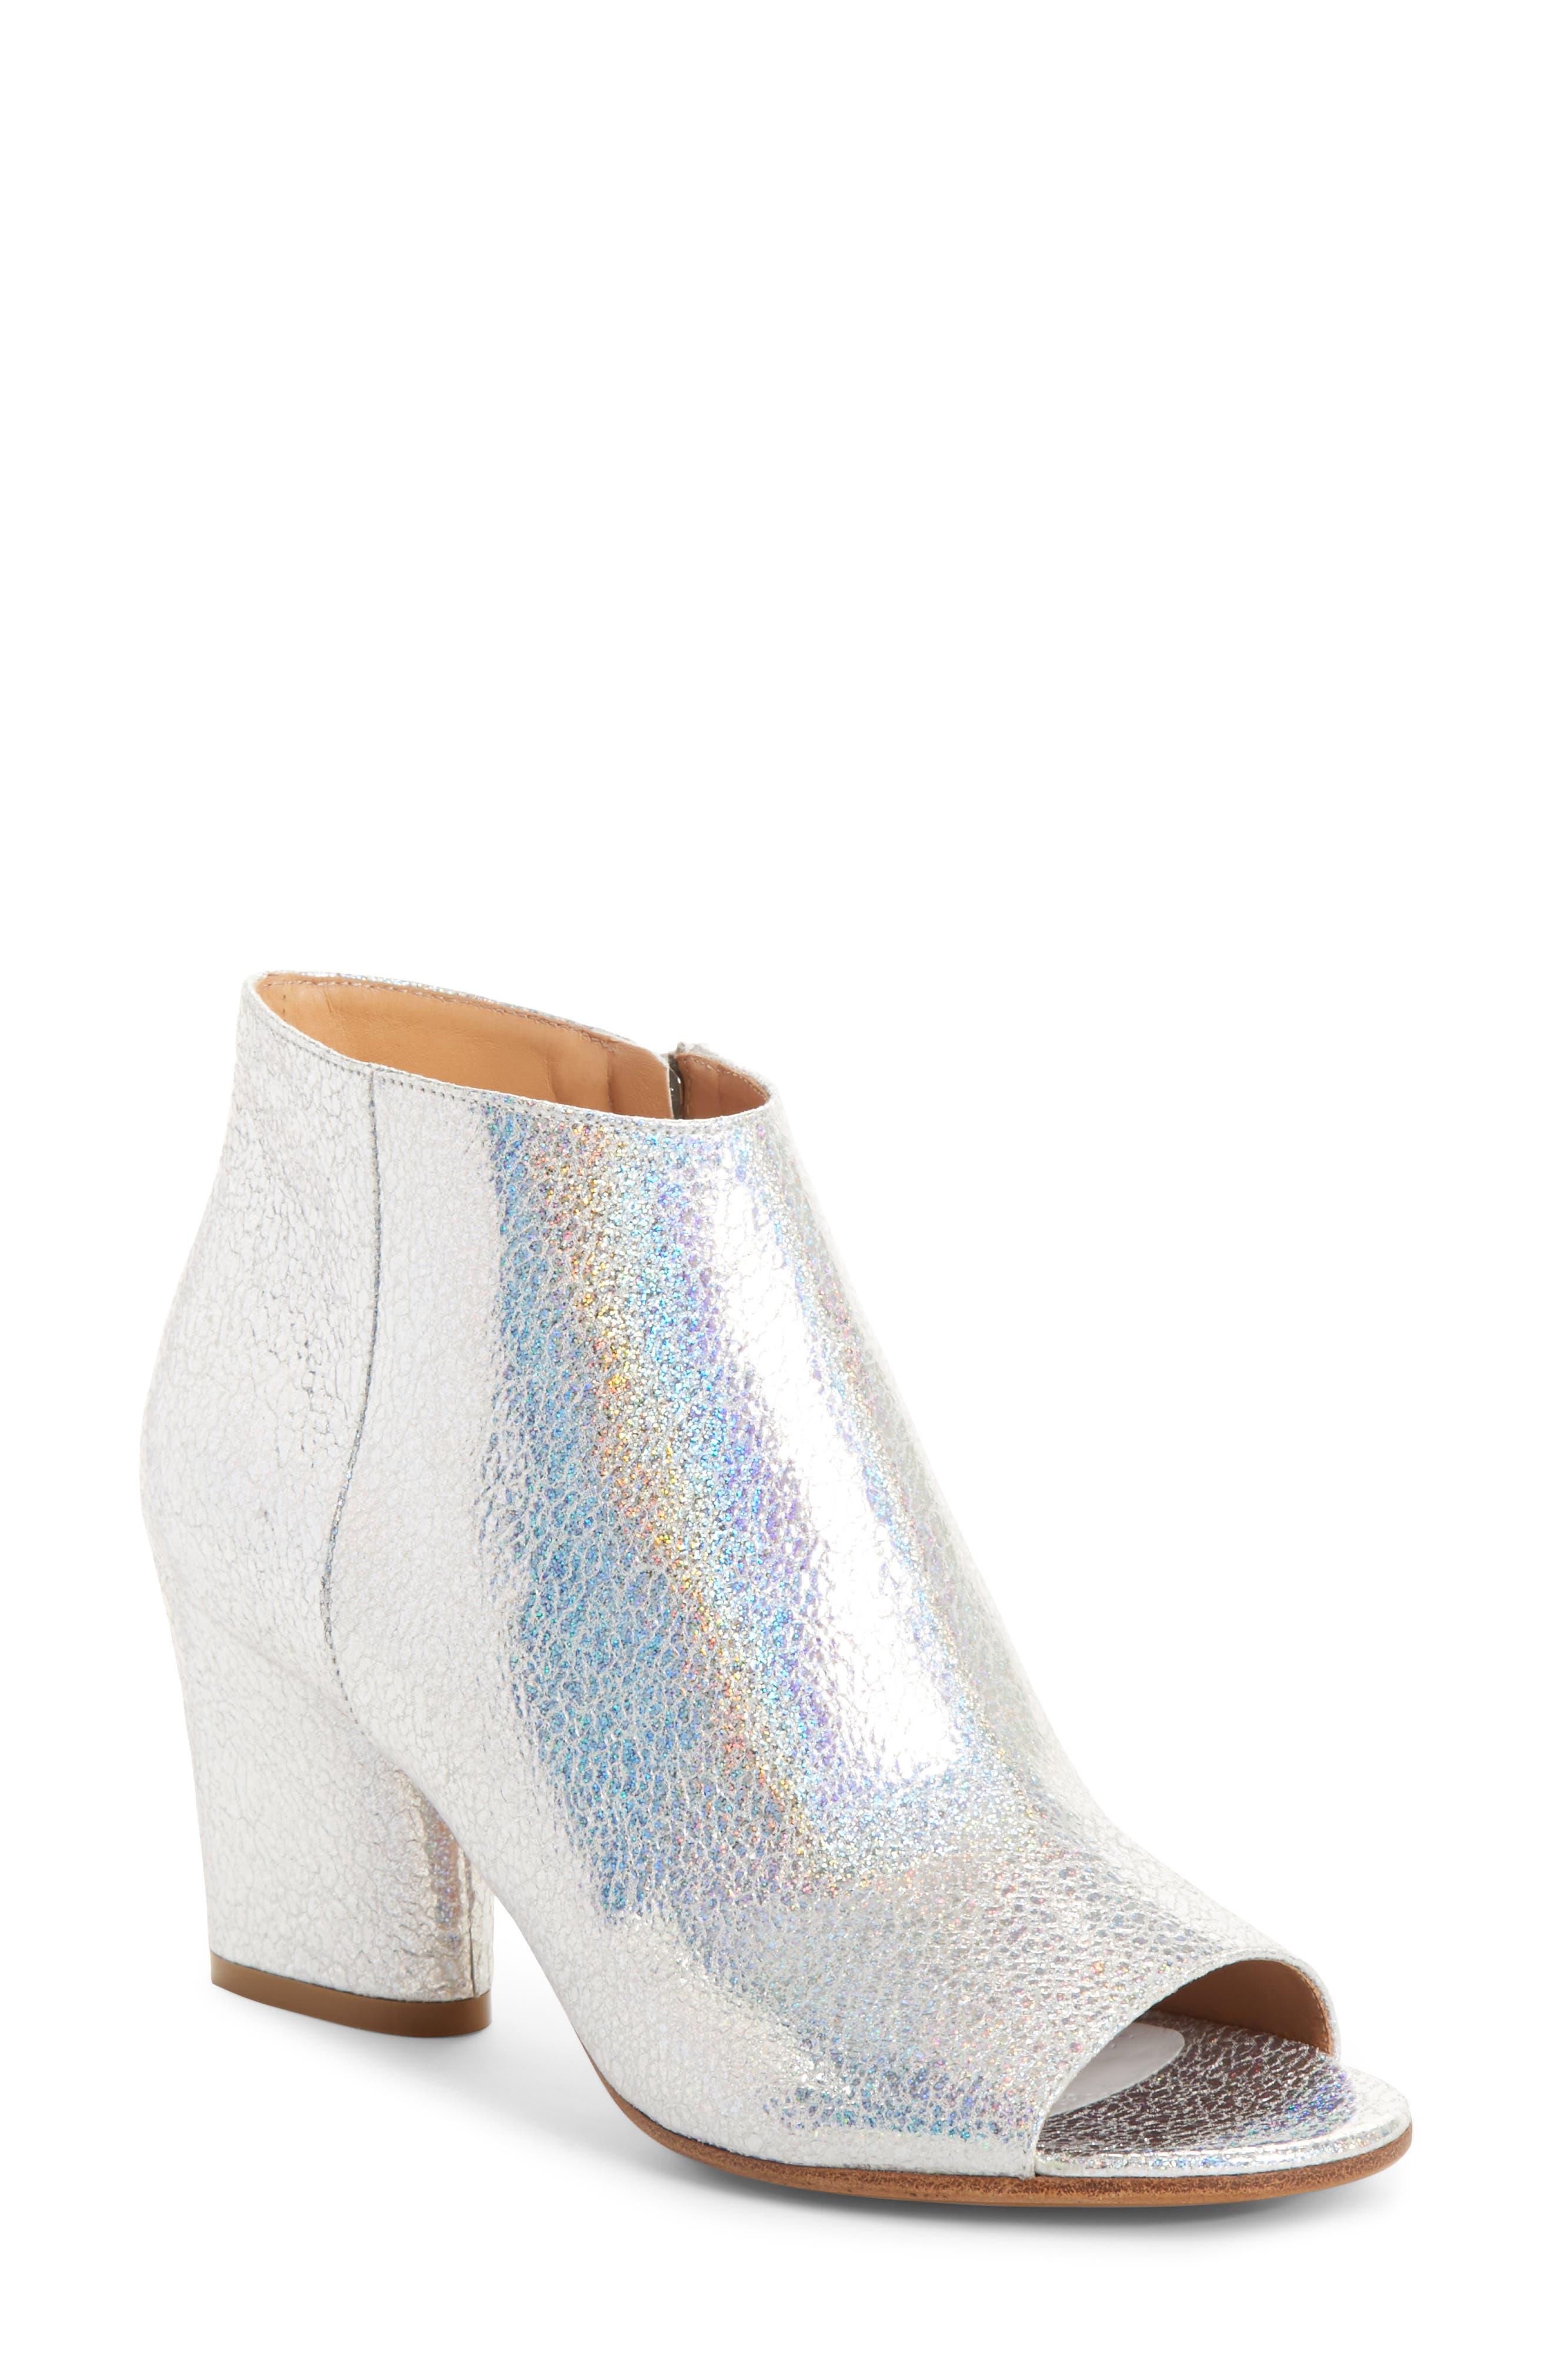 Maison Margiela Metallic Open Toe Ankle Boot (Women)